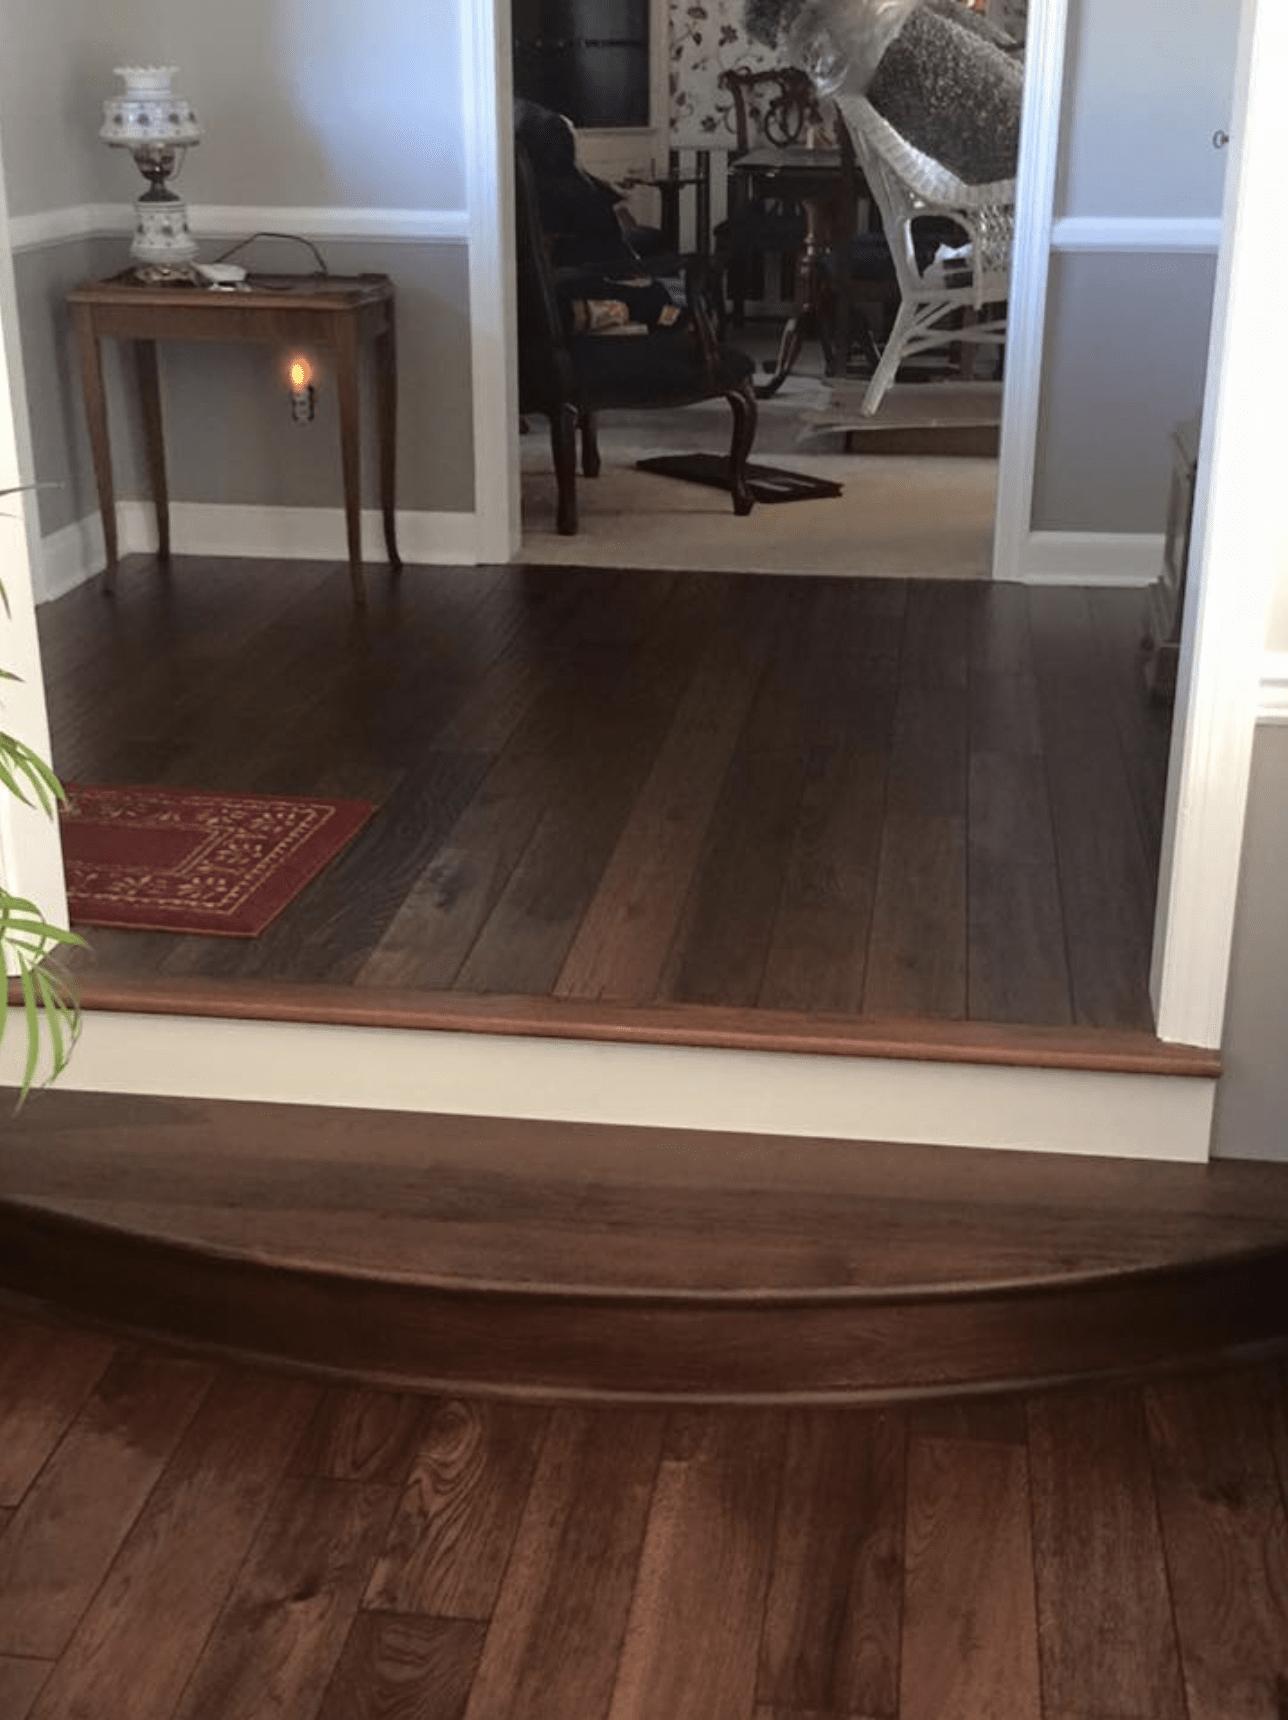 Hardwood flooring from Charles Tyre Flooring in Odessa, DE